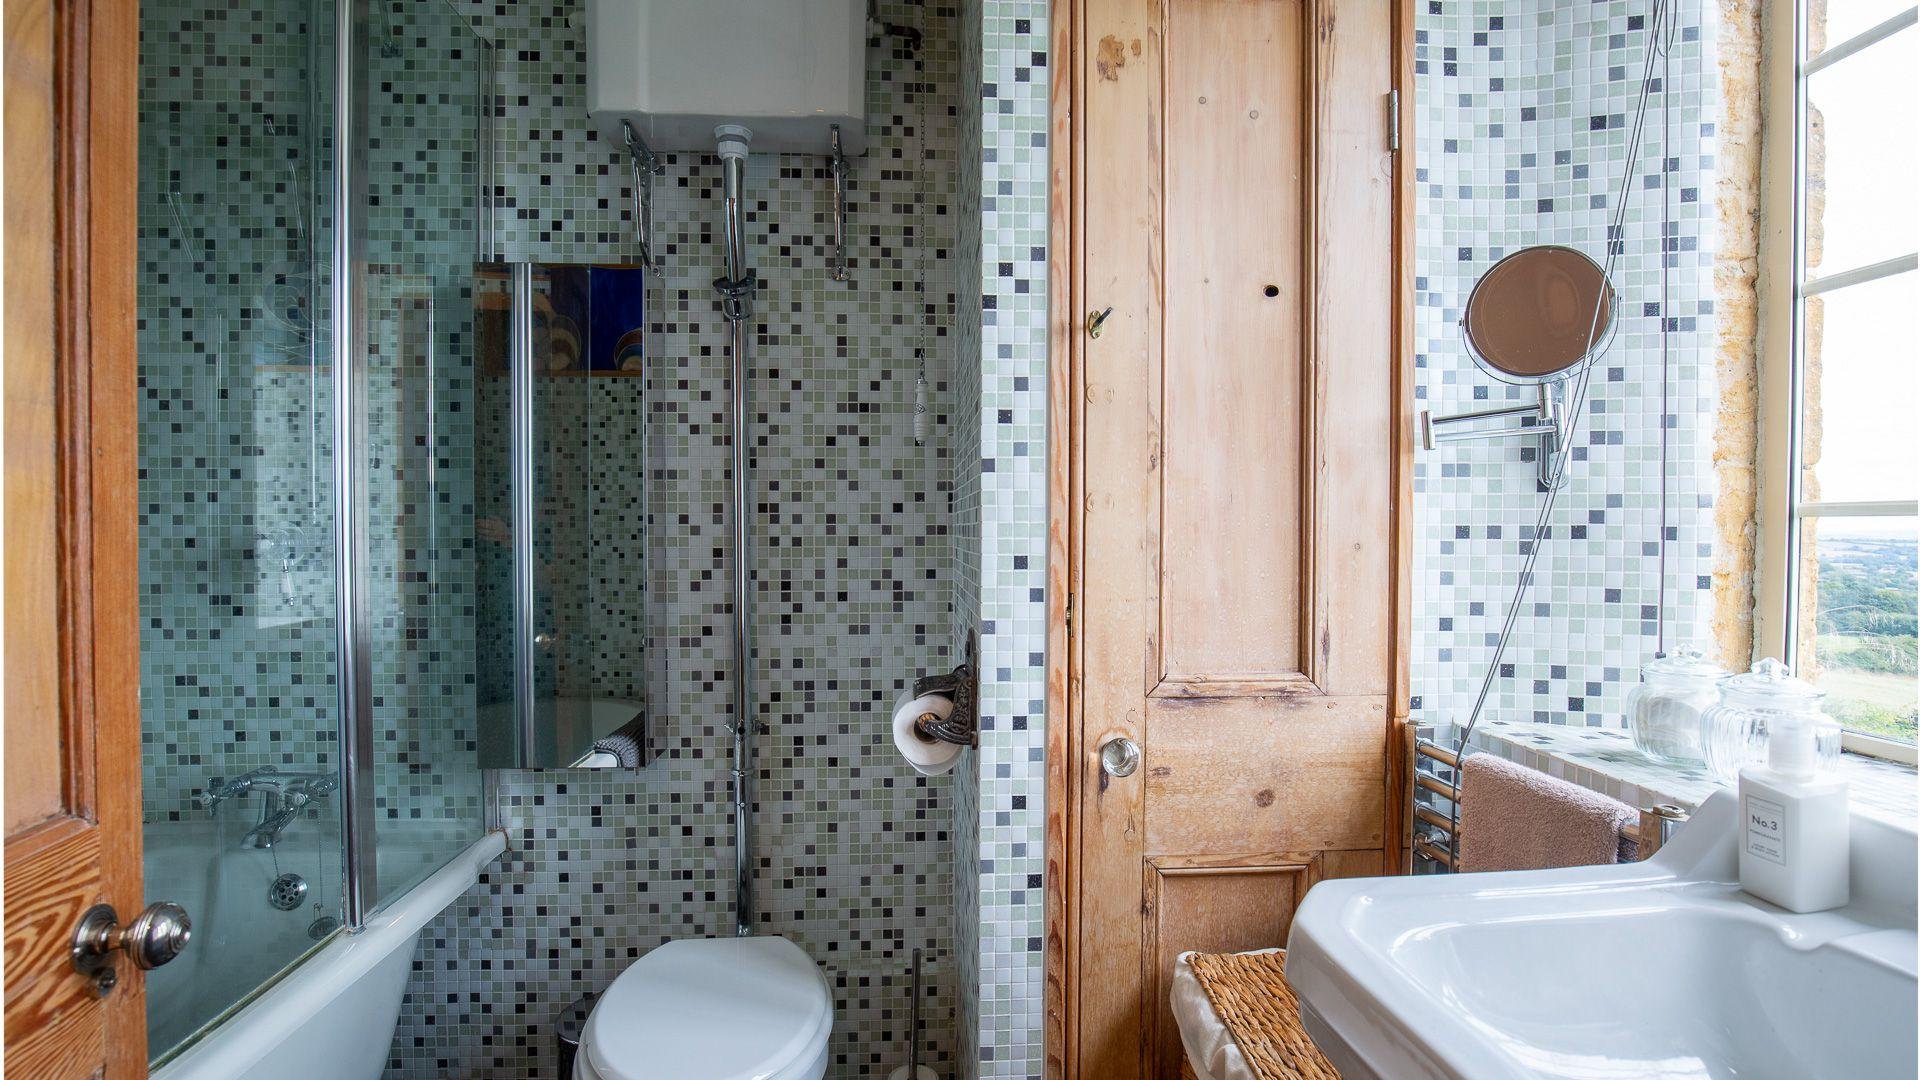 Bathroom, Honeysuckle Cottage, Bolthole Retreats